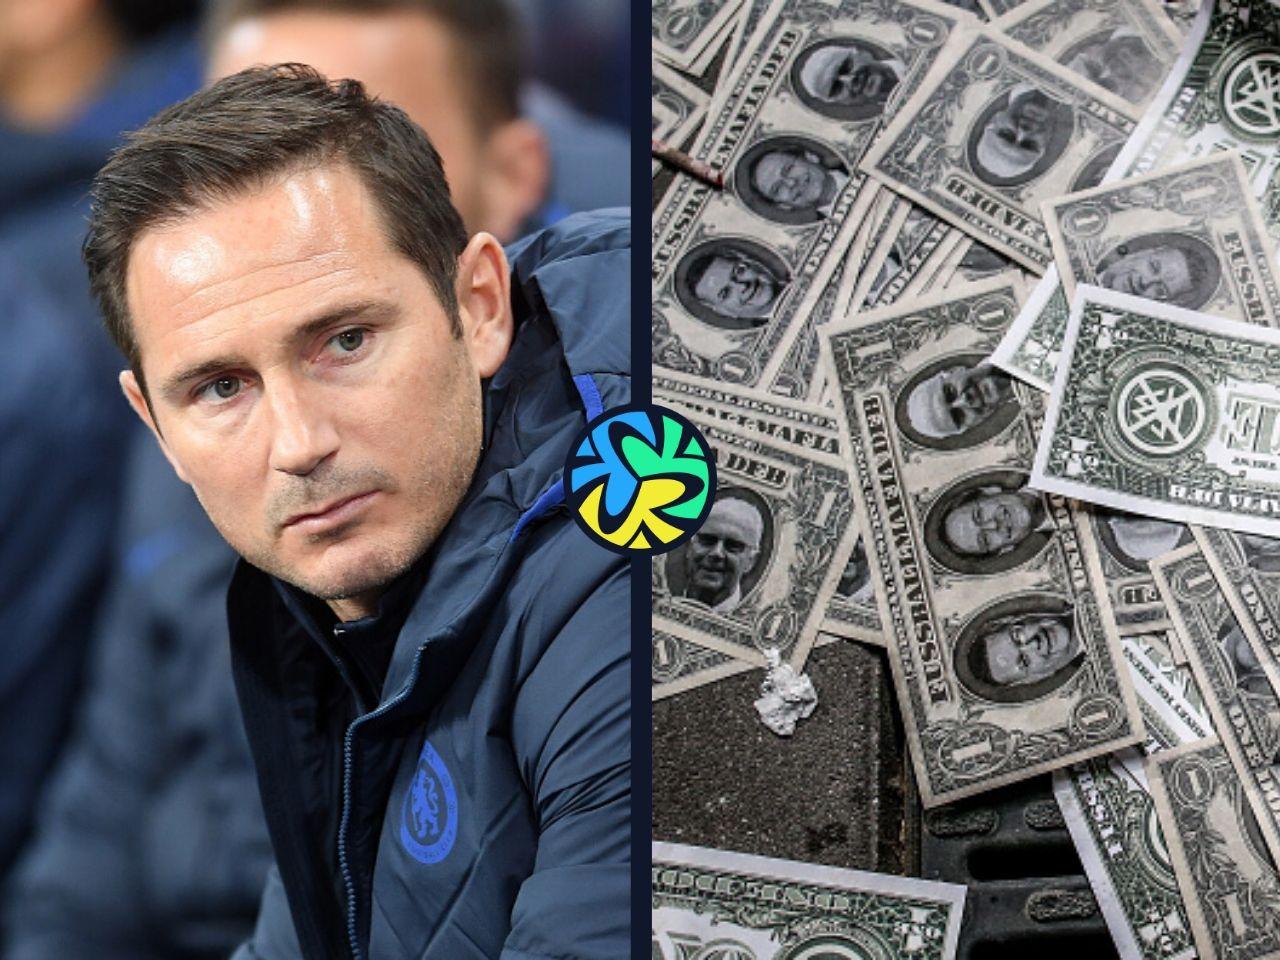 Chelsea, transfer targets, Frank Lampard, CAS, Premier League